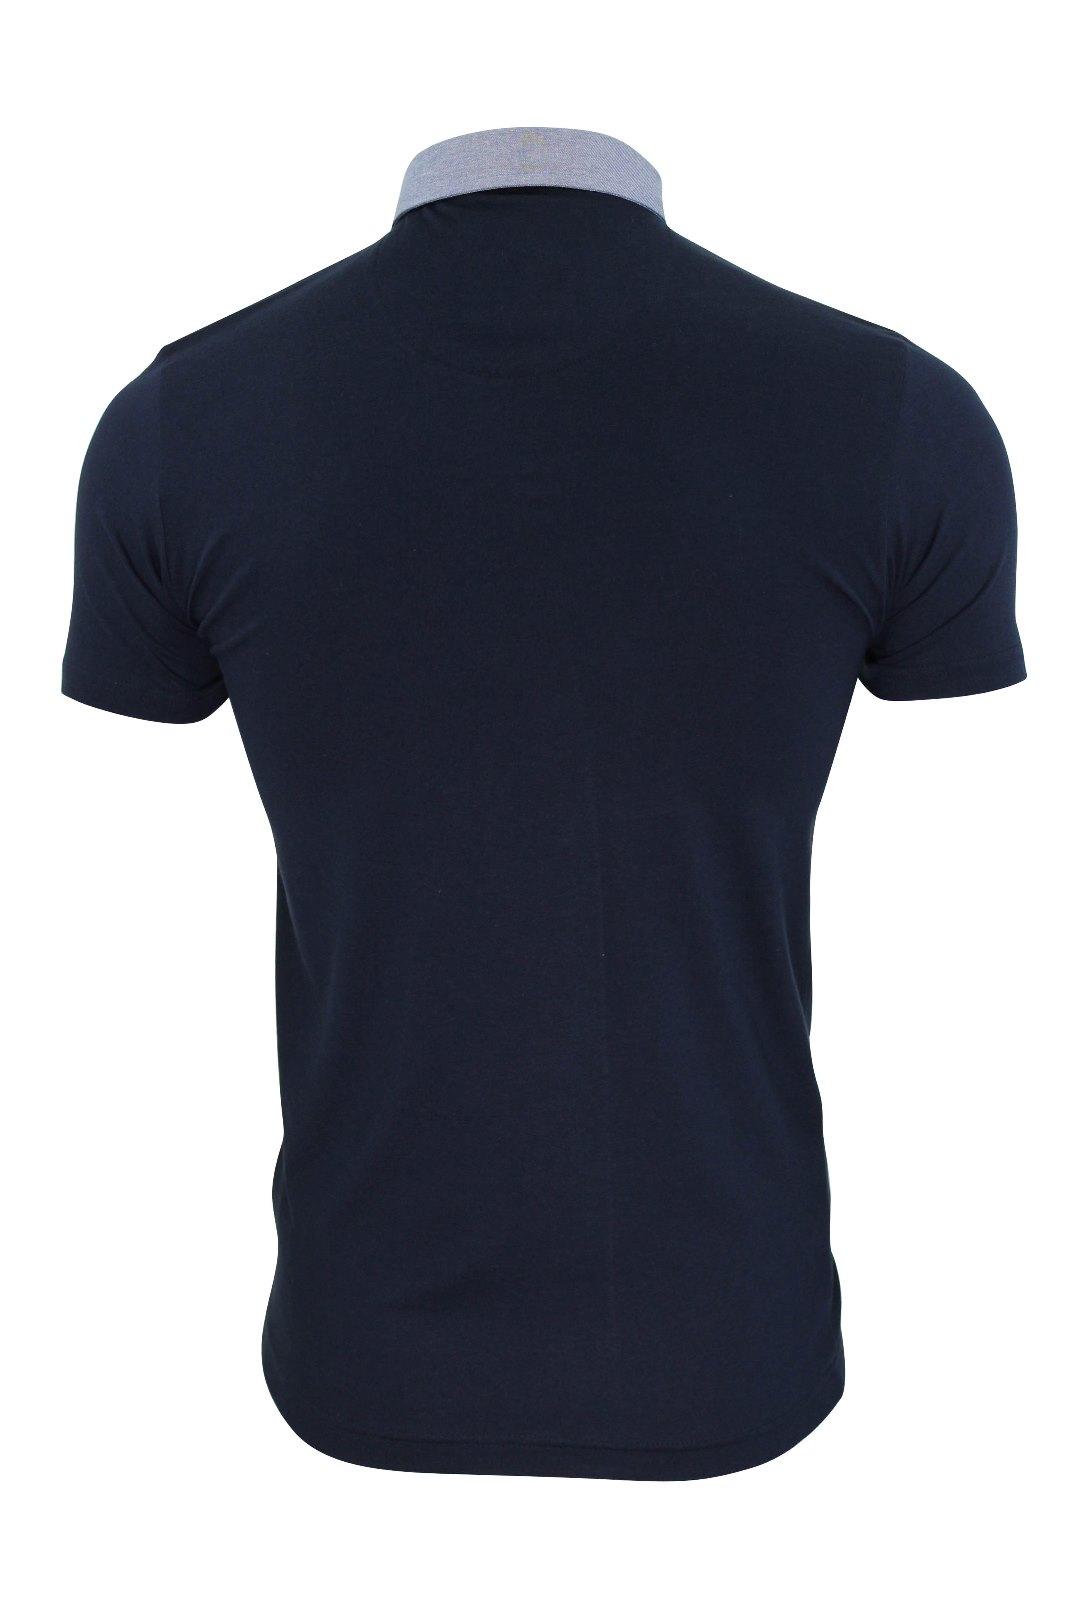 Mens-Polo-T-Shirt-Chimera-Brave-Soul-Denim-Chambray-Collar-Short-Sleeved-Cotton thumbnail 23